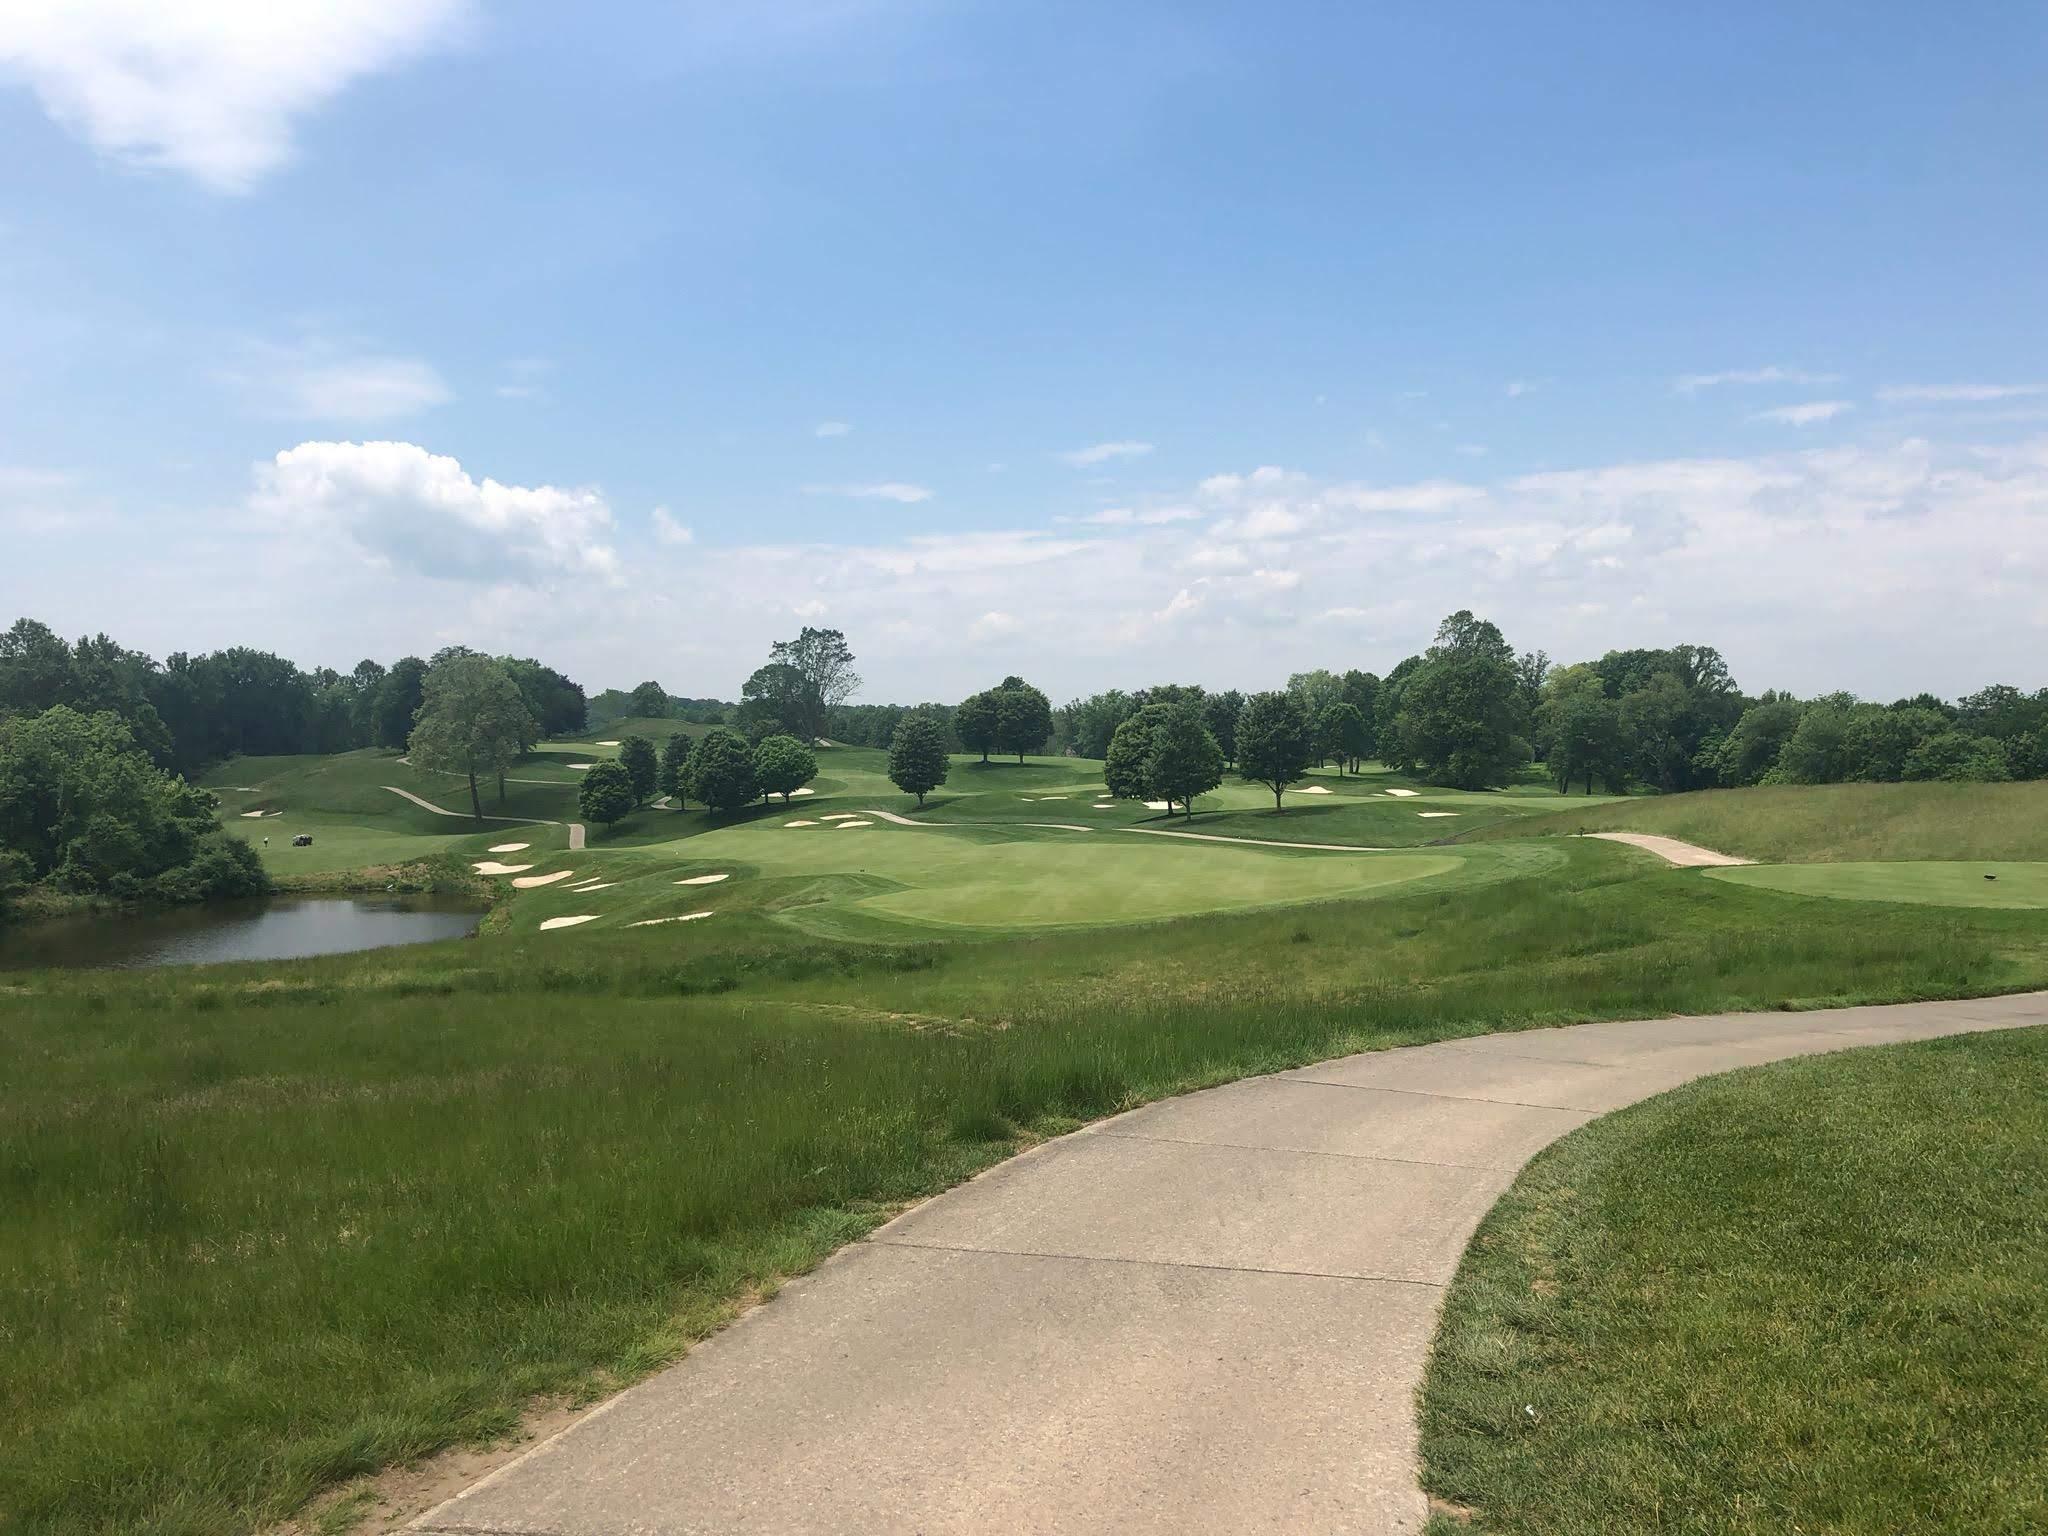 golf-outing-2019-15.jpg